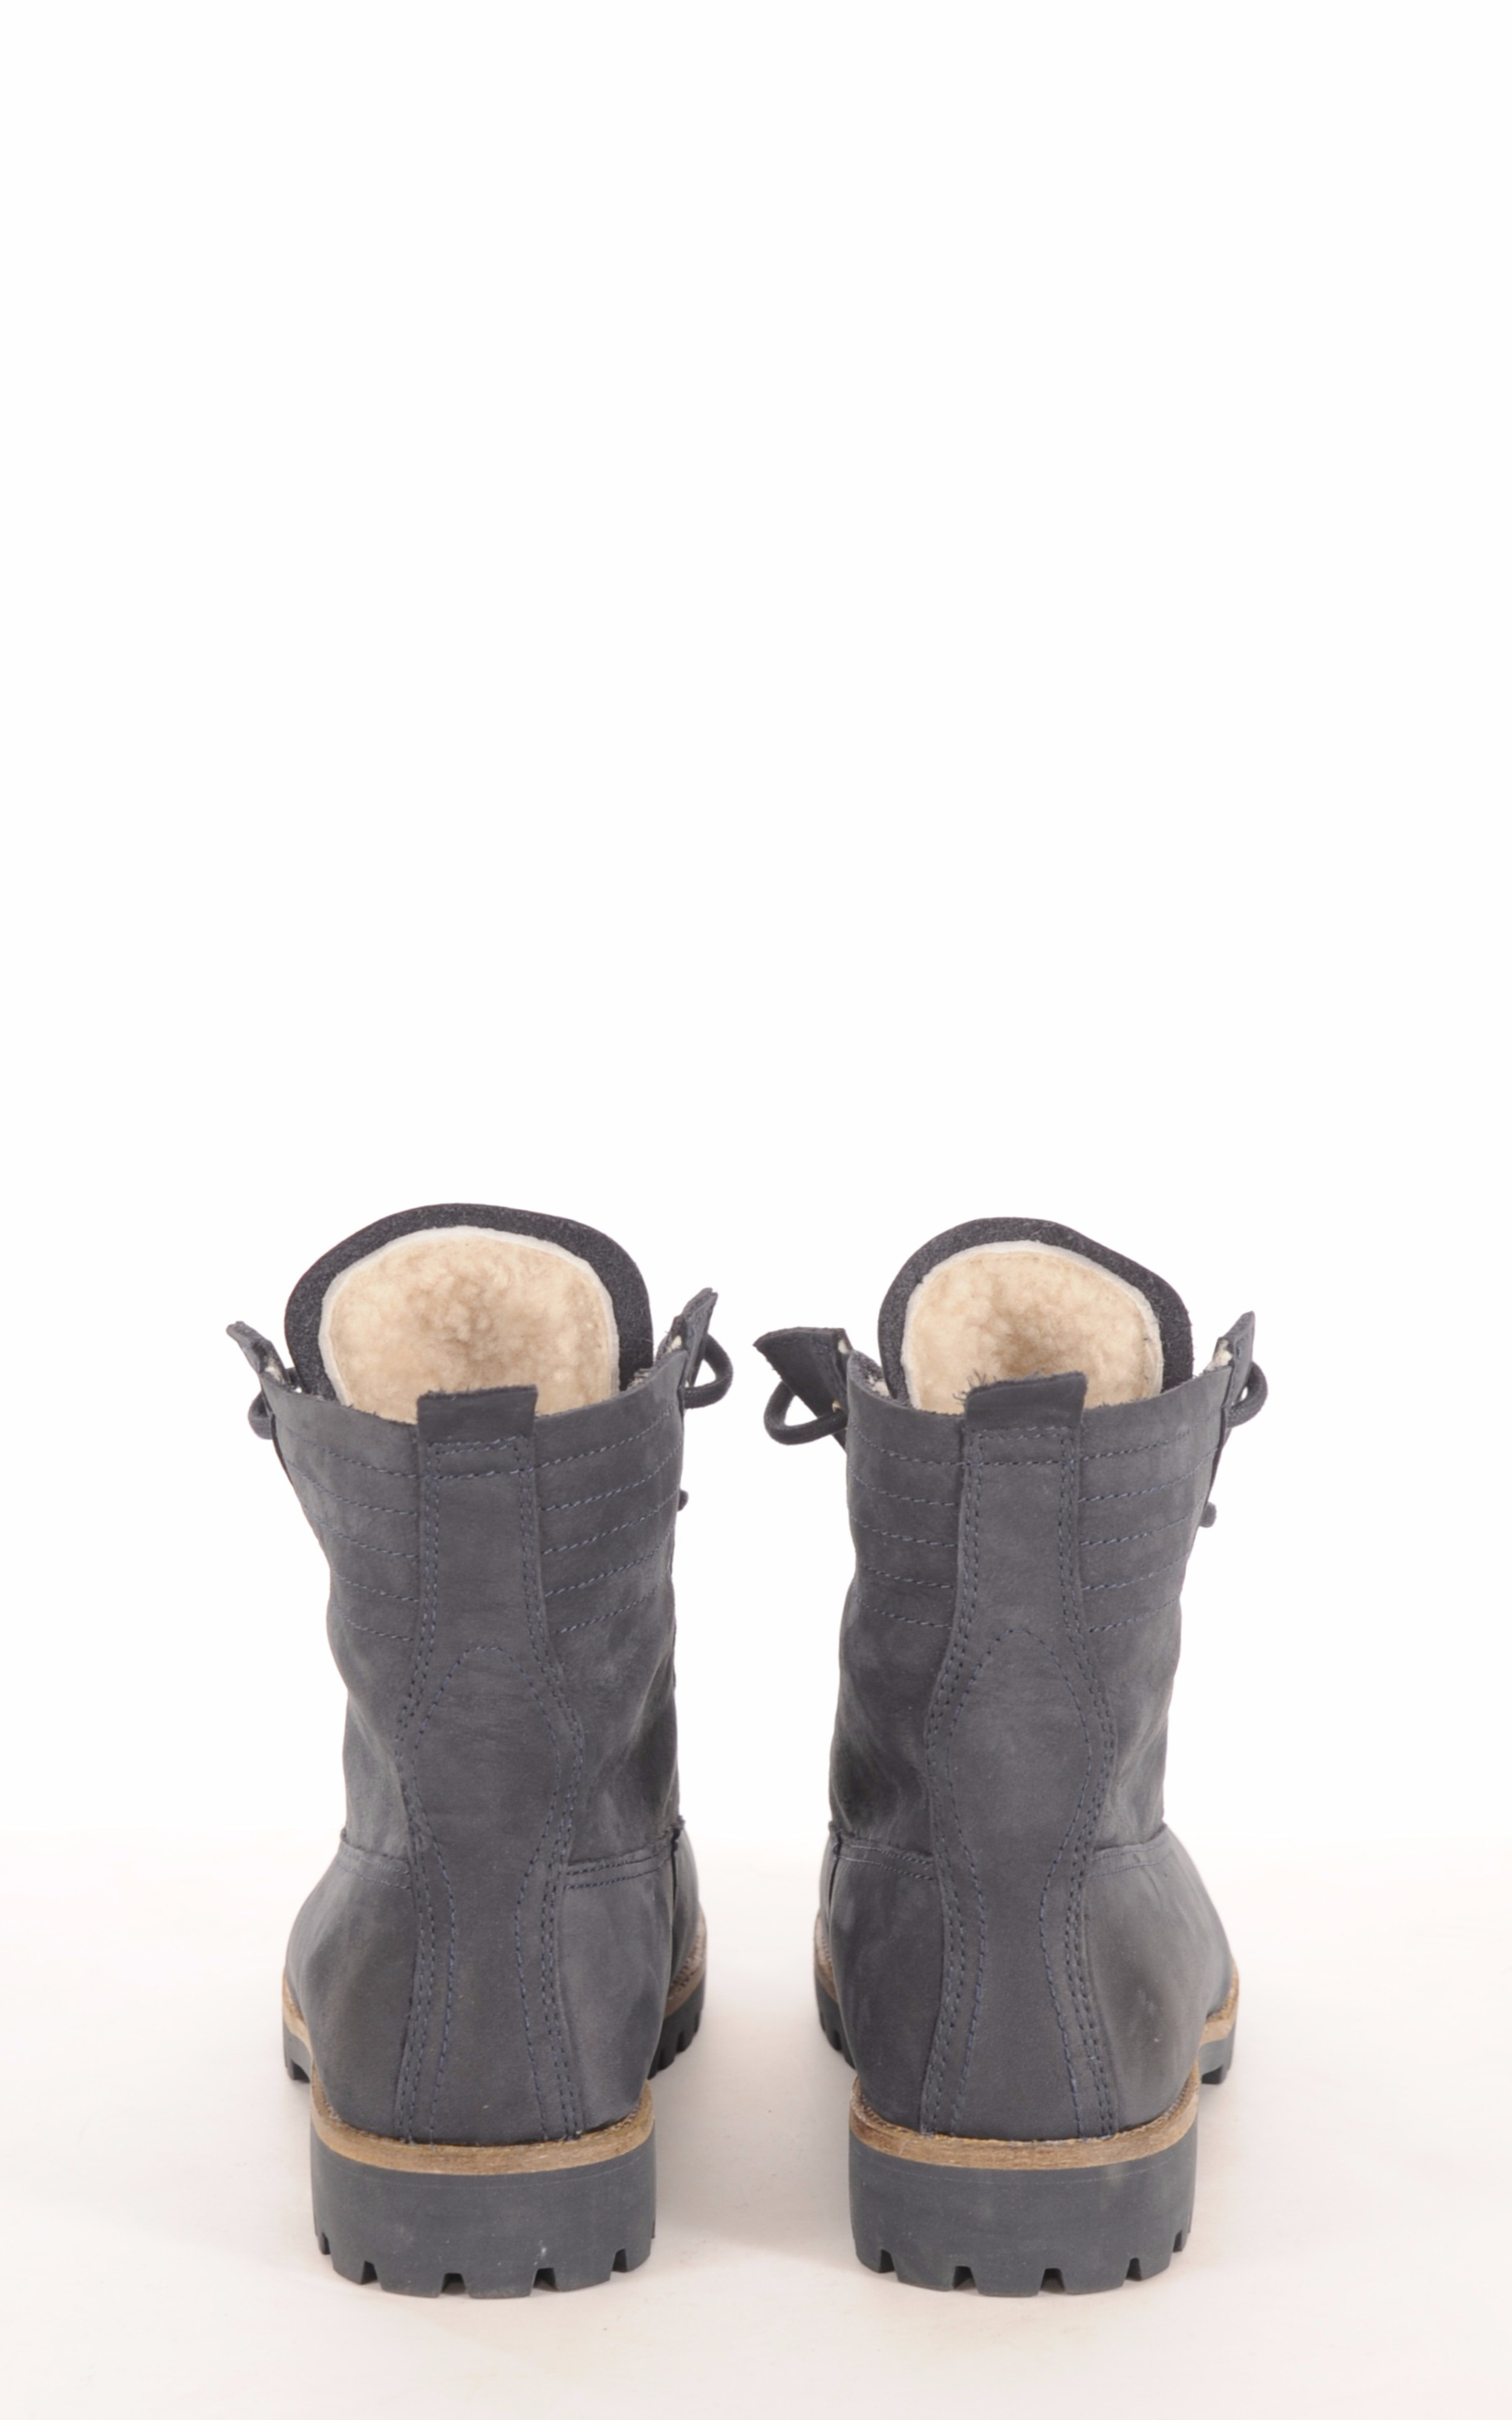 Boots Mouton Bleu Denim Femme Blackstone